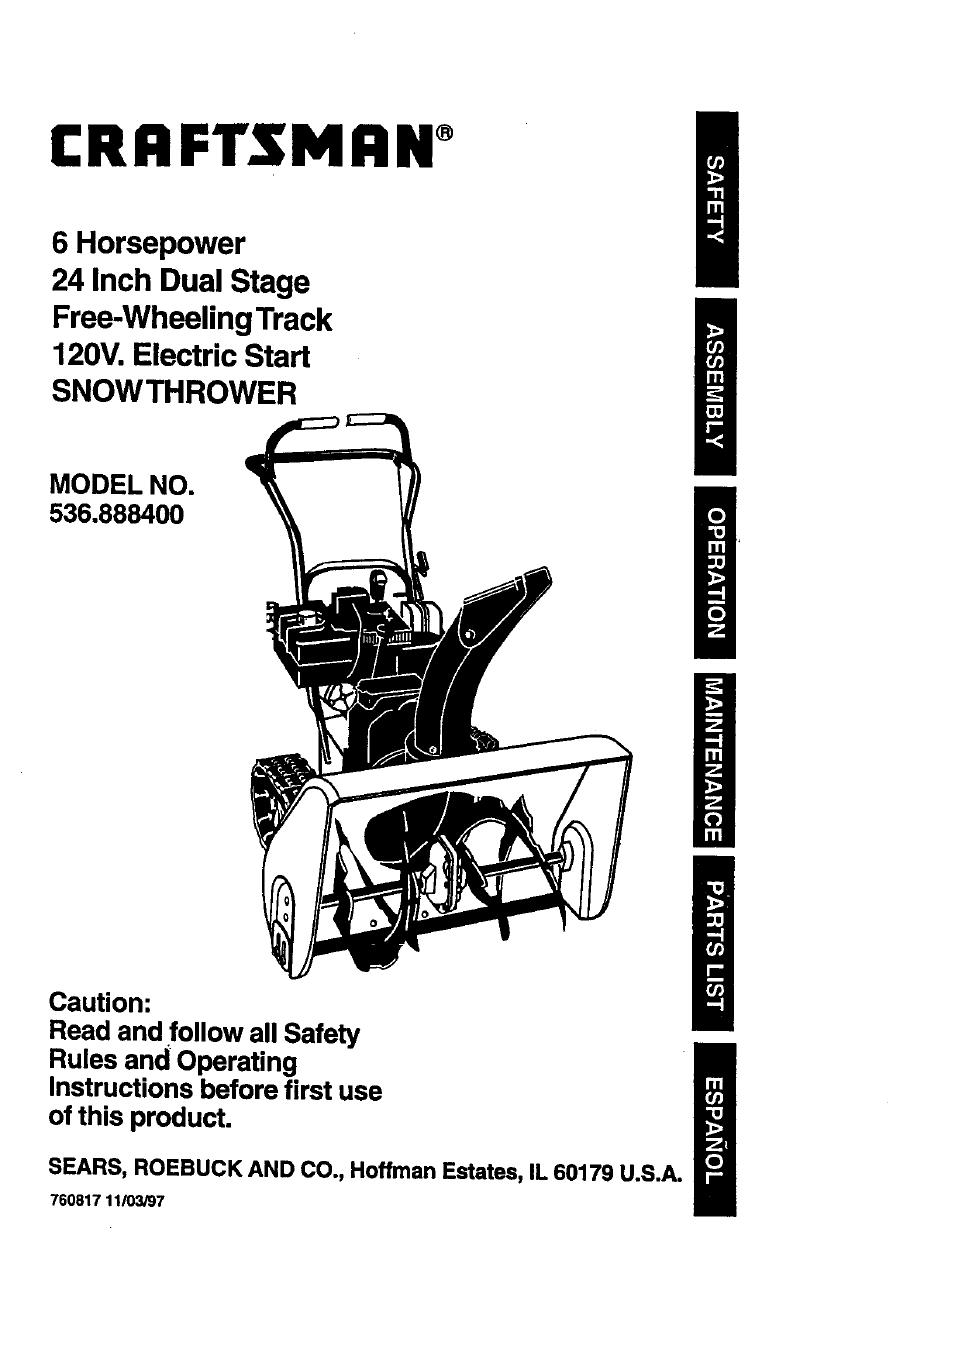 3 1 engine diagram free download craftsman 536 888400 user manual 42 pages  craftsman 536 888400 user manual 42 pages